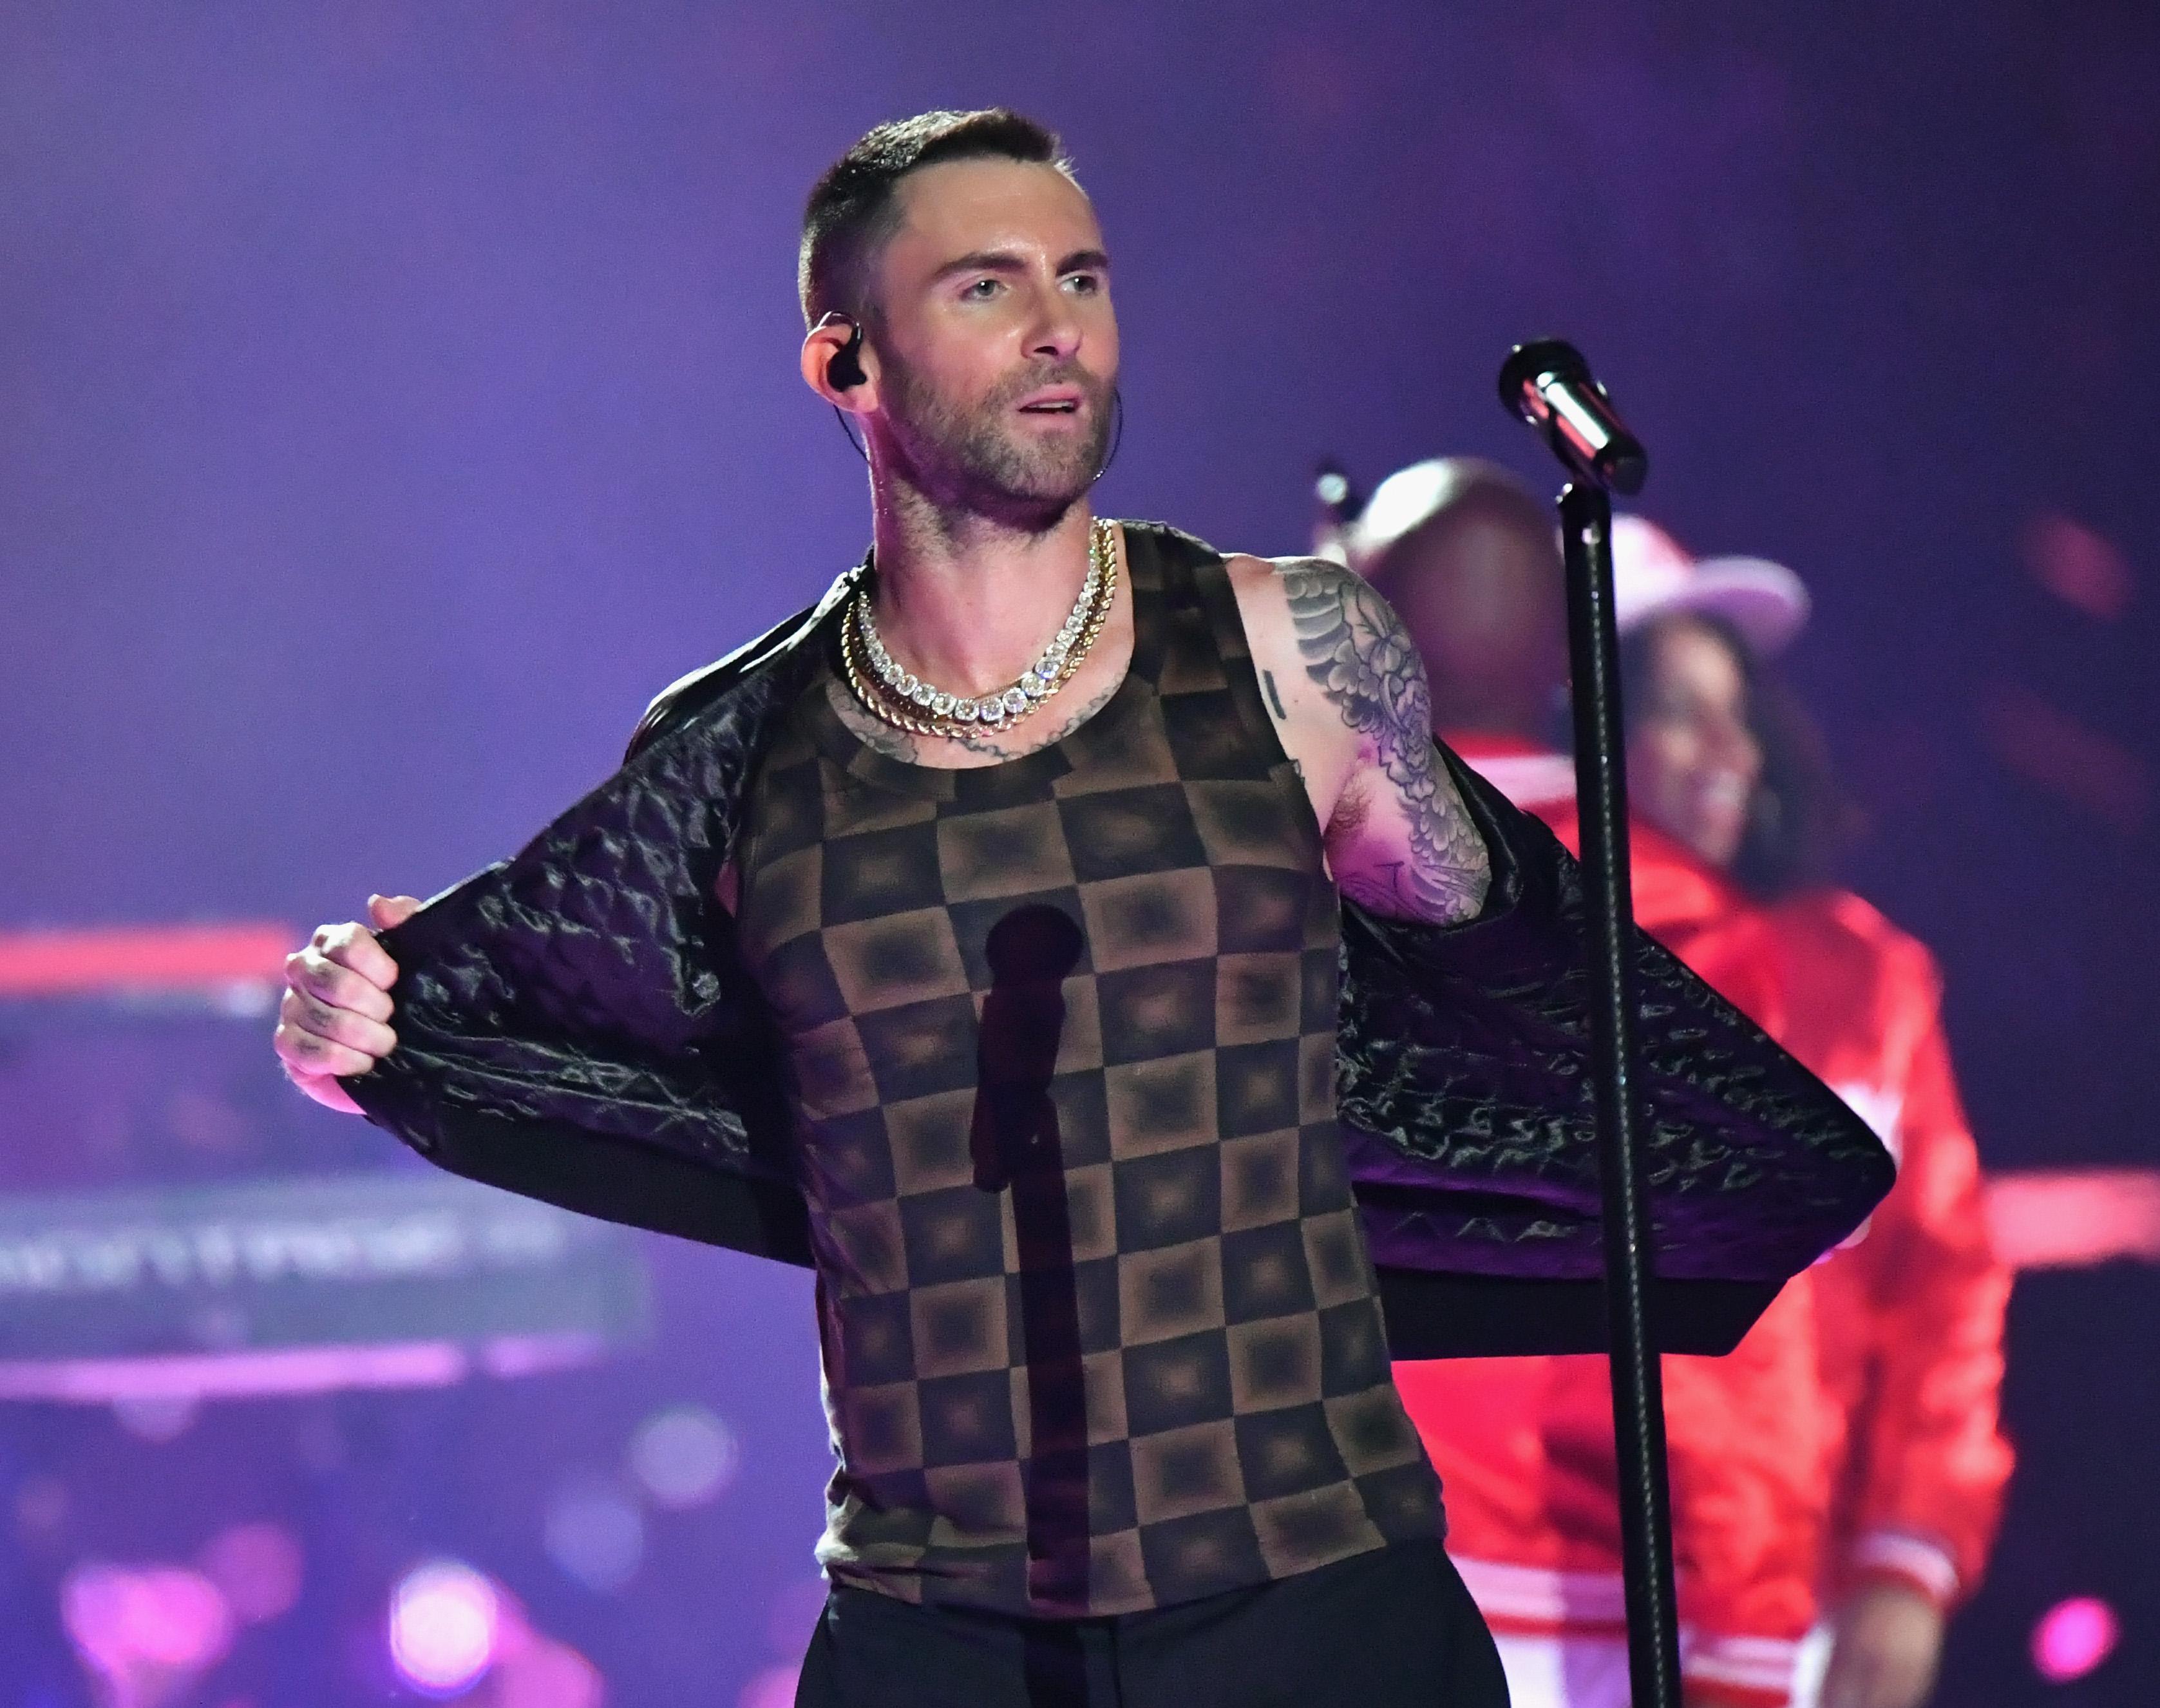 77afaae9 Super Bowl 2019 halftime show: Why Adam Levine's shirt looks like ...